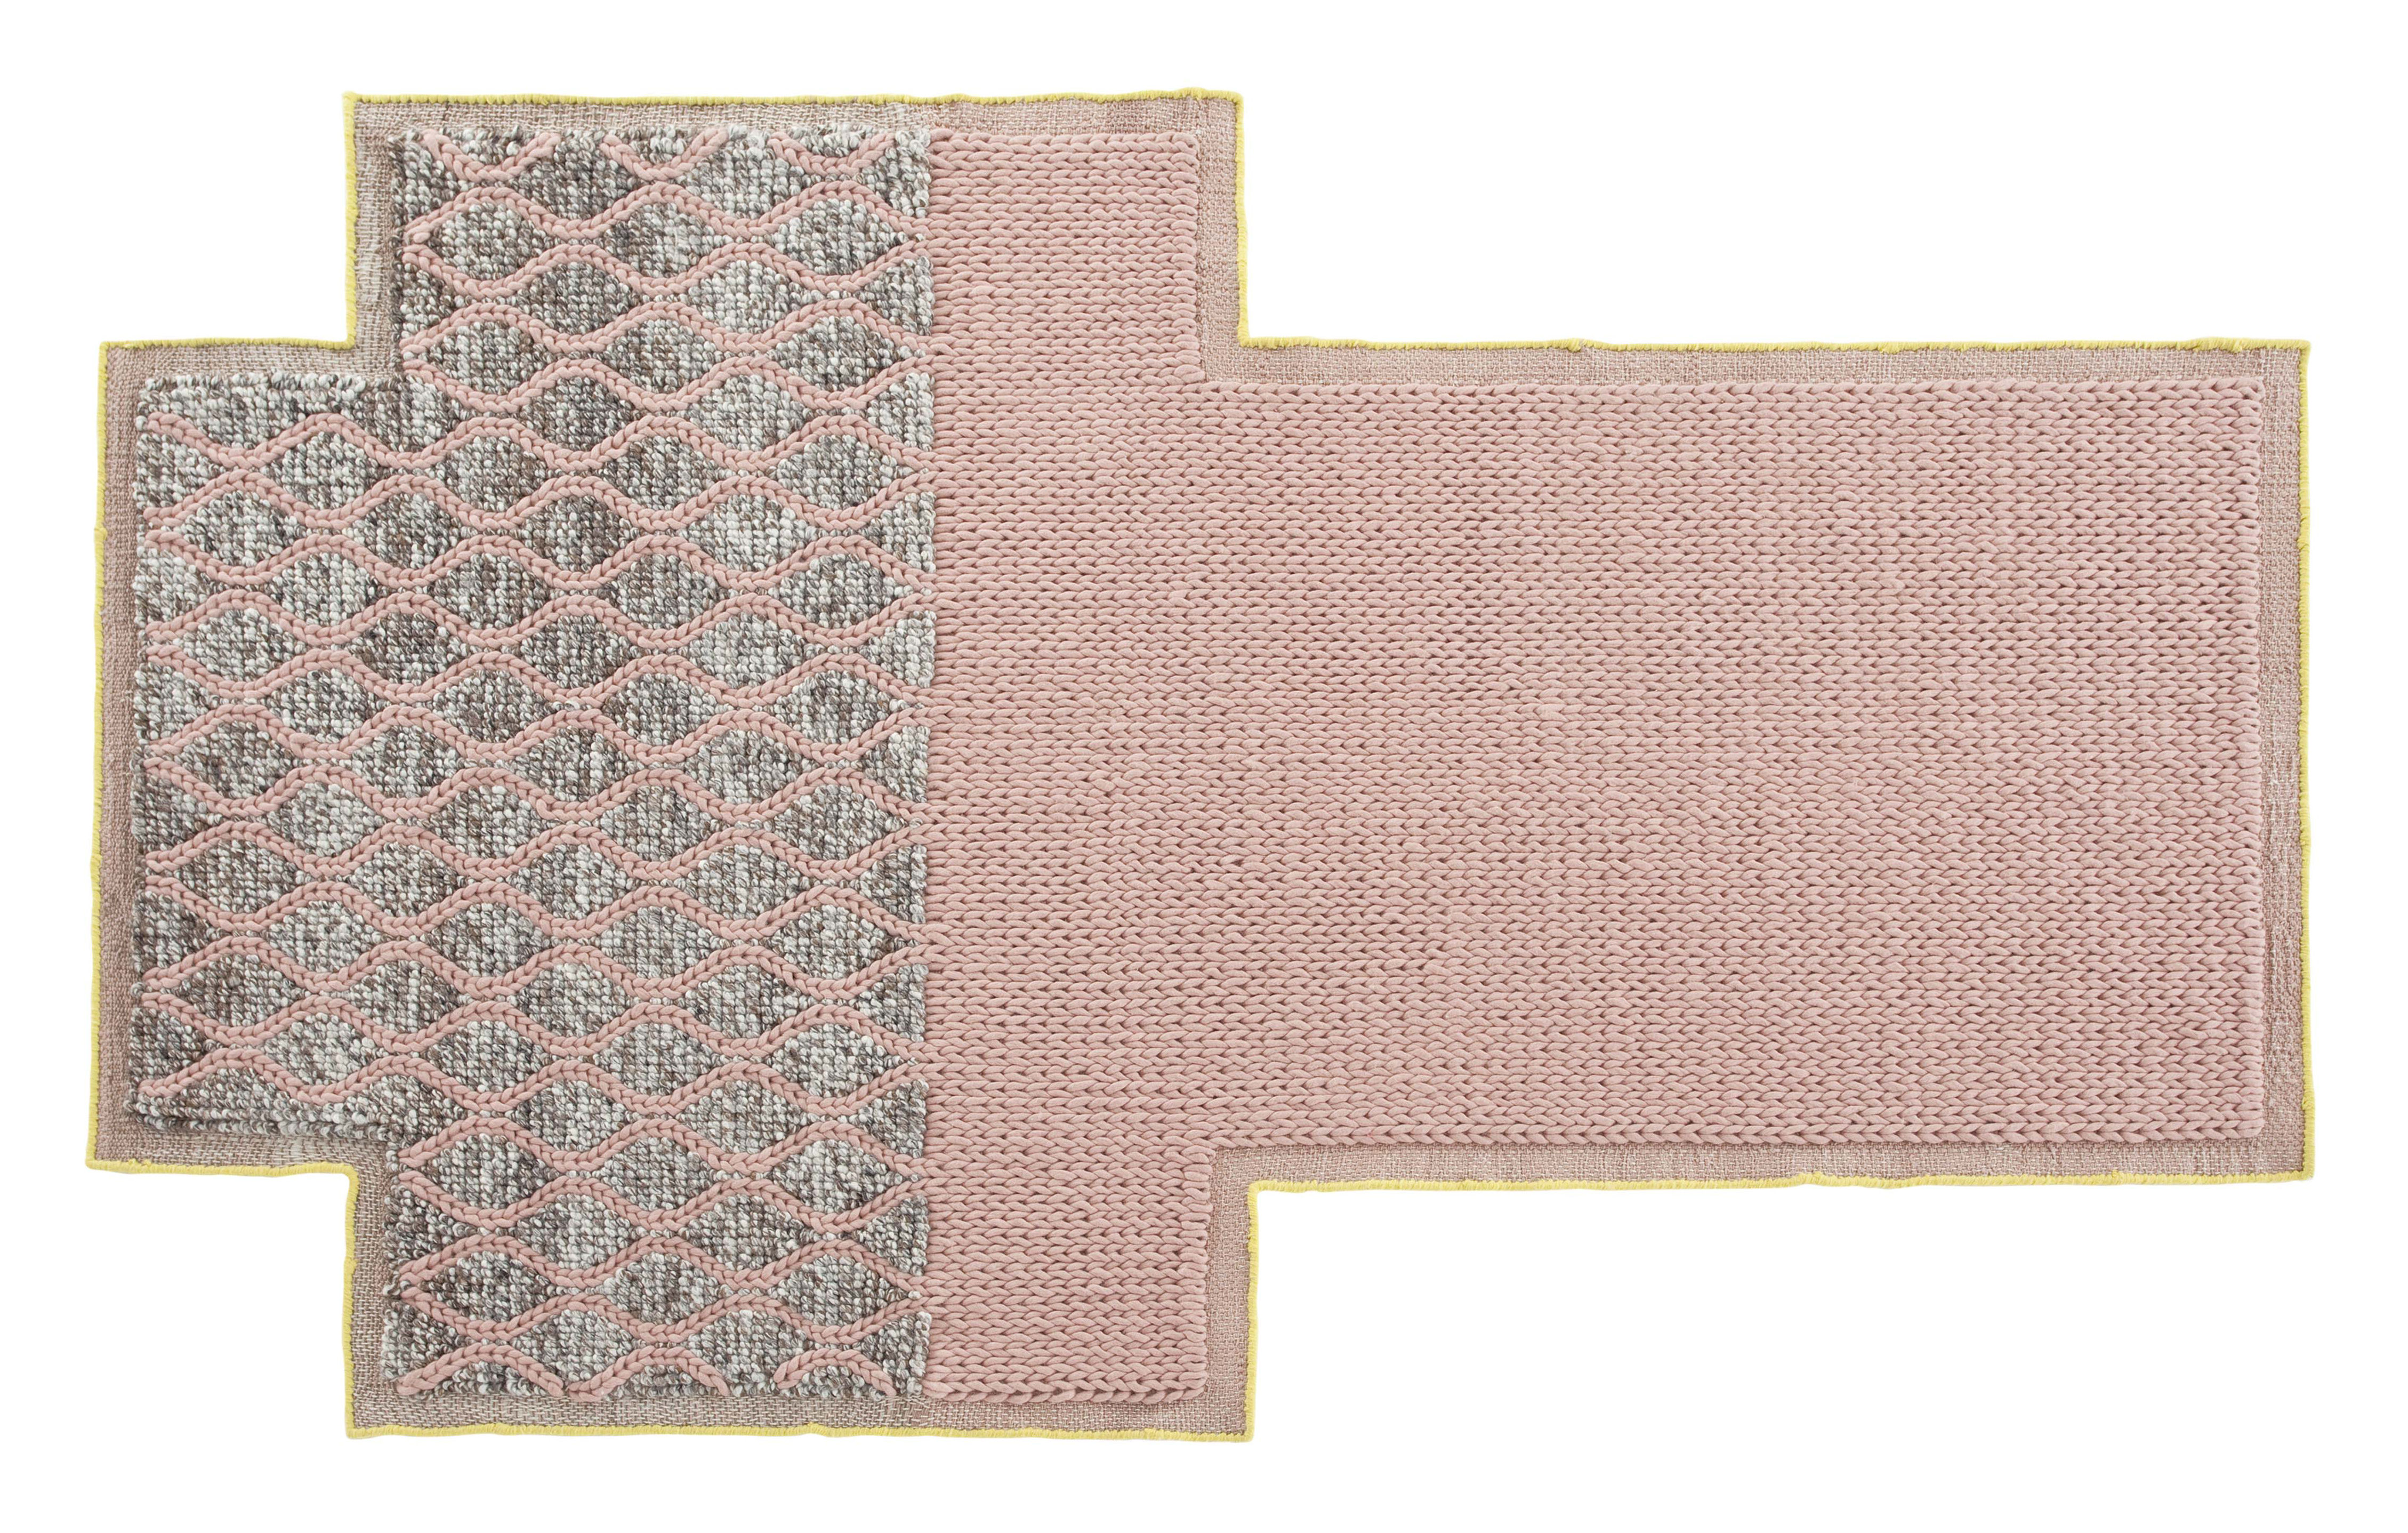 Interni - Tappeti - Tappeto Mangas Space Rhombus - / 250 x 160 cm di Gan - Rosa - Laine vierge